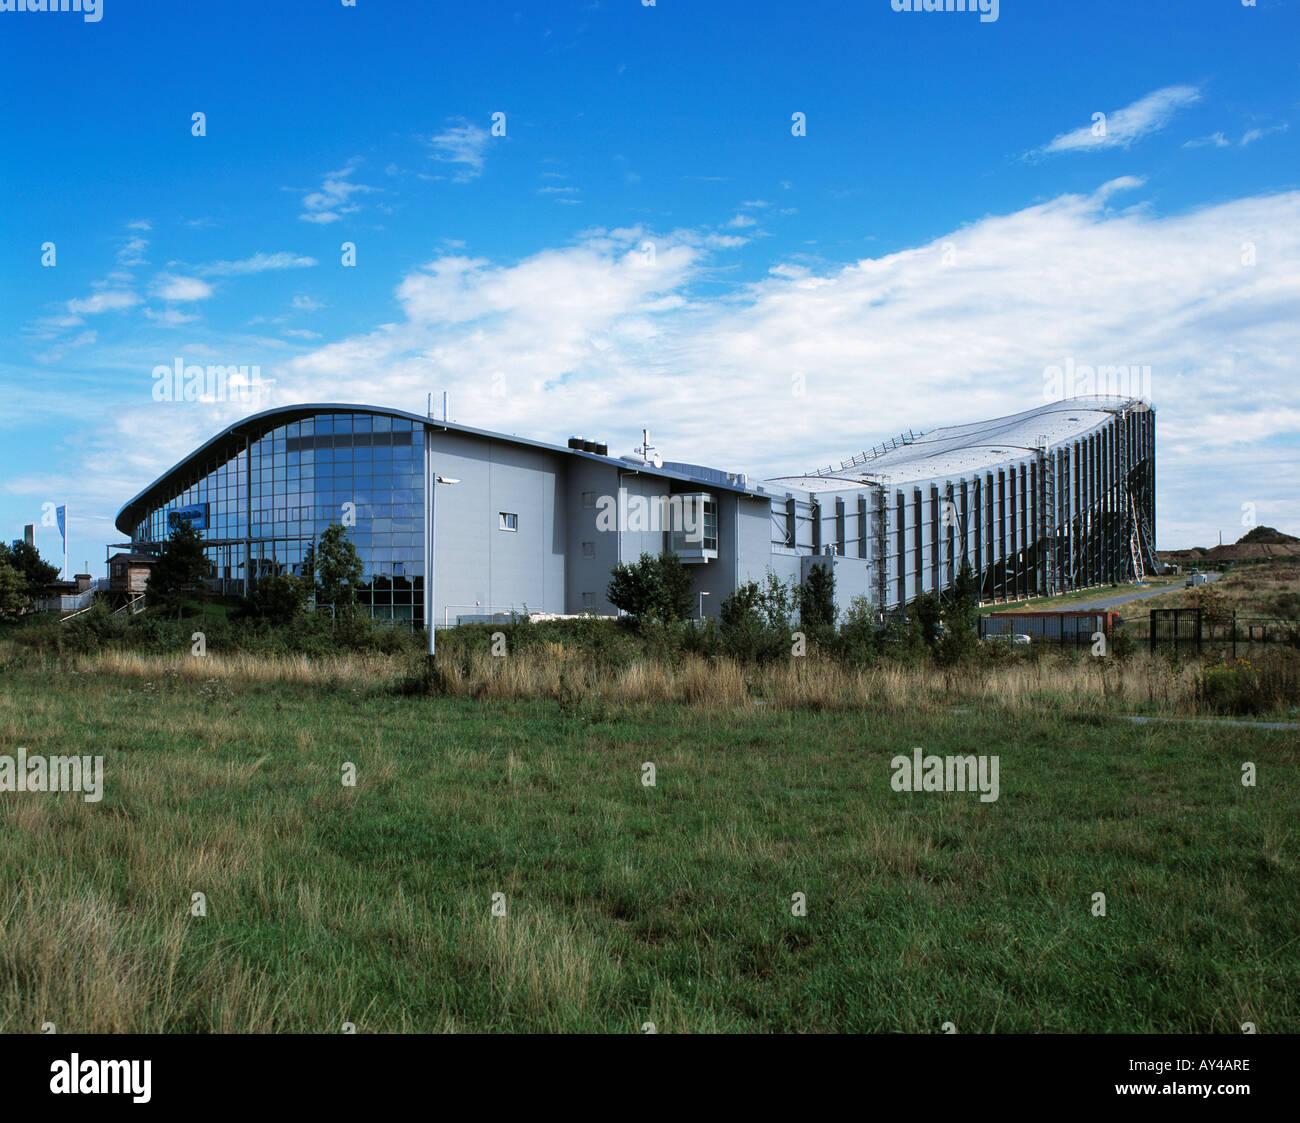 D-Neuss, Lower Rhine, North Rhine-Westphalia, the Ski Hall Winterworld was opened in 2001 - Stock Image